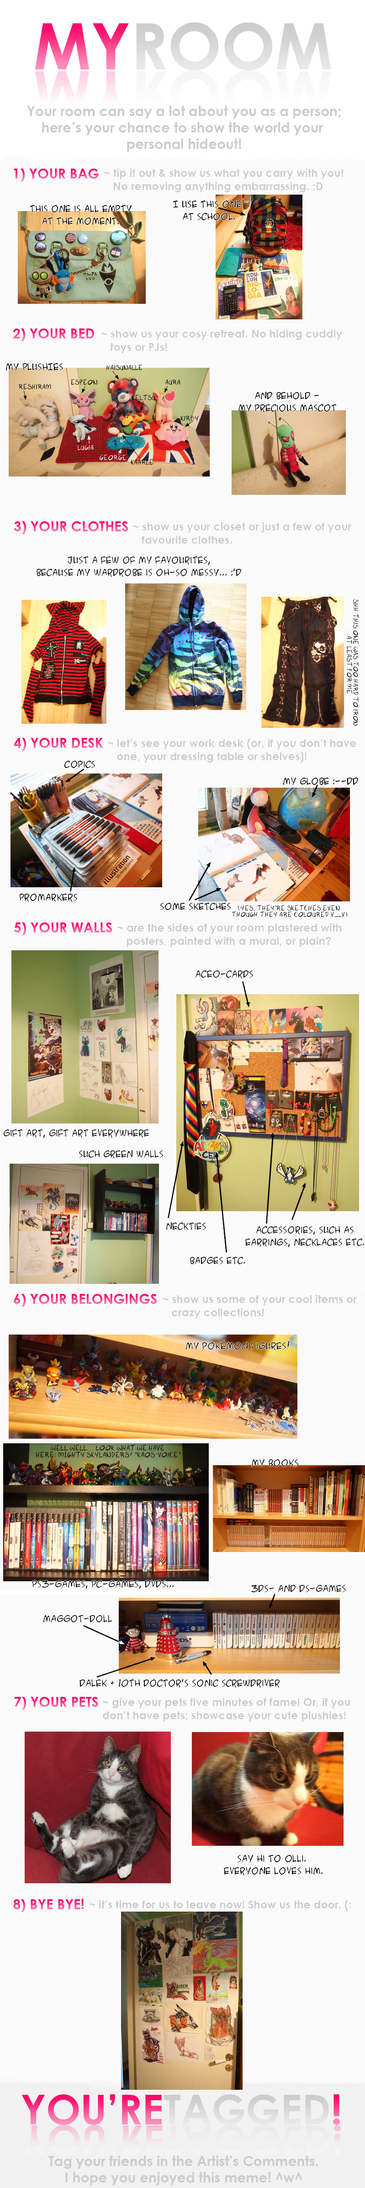 My Room : Meme by AikenLugiA